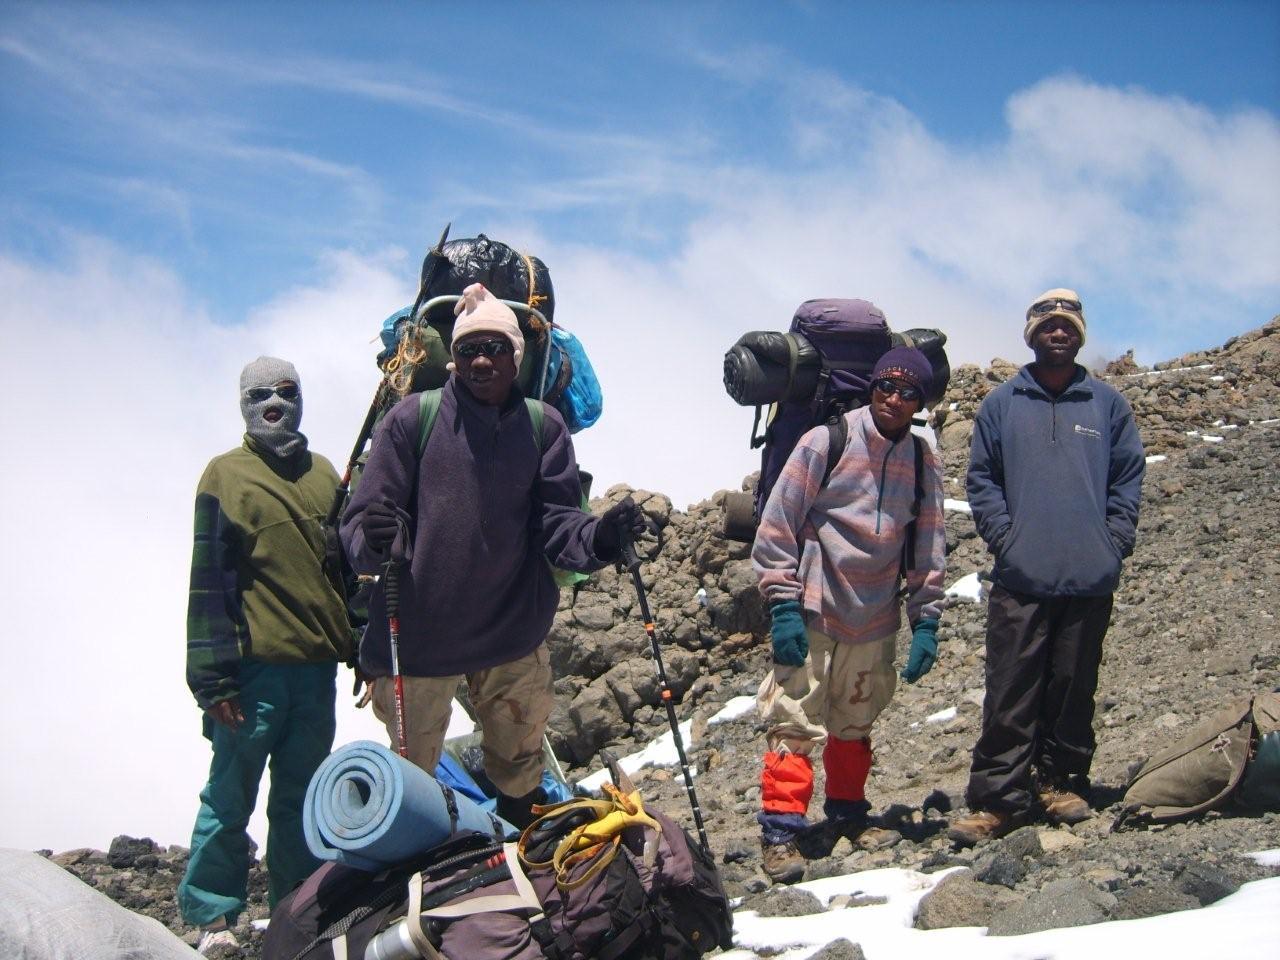 Kilimanjaro Alpine Service Staff on Kilimanjaro